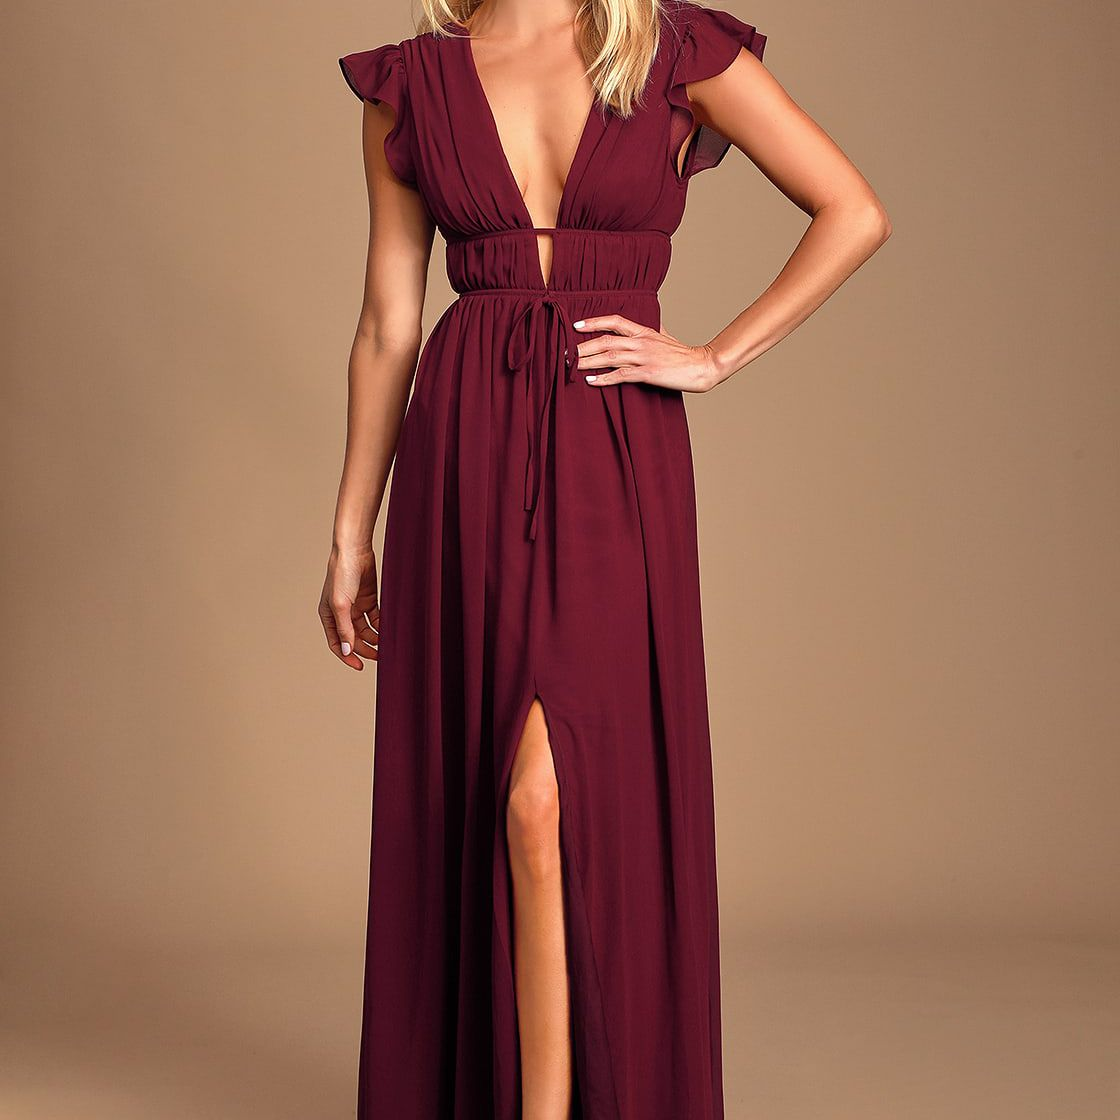 Lulus I'm All Yours Burgundy Ruffled Maxi Dress, $72